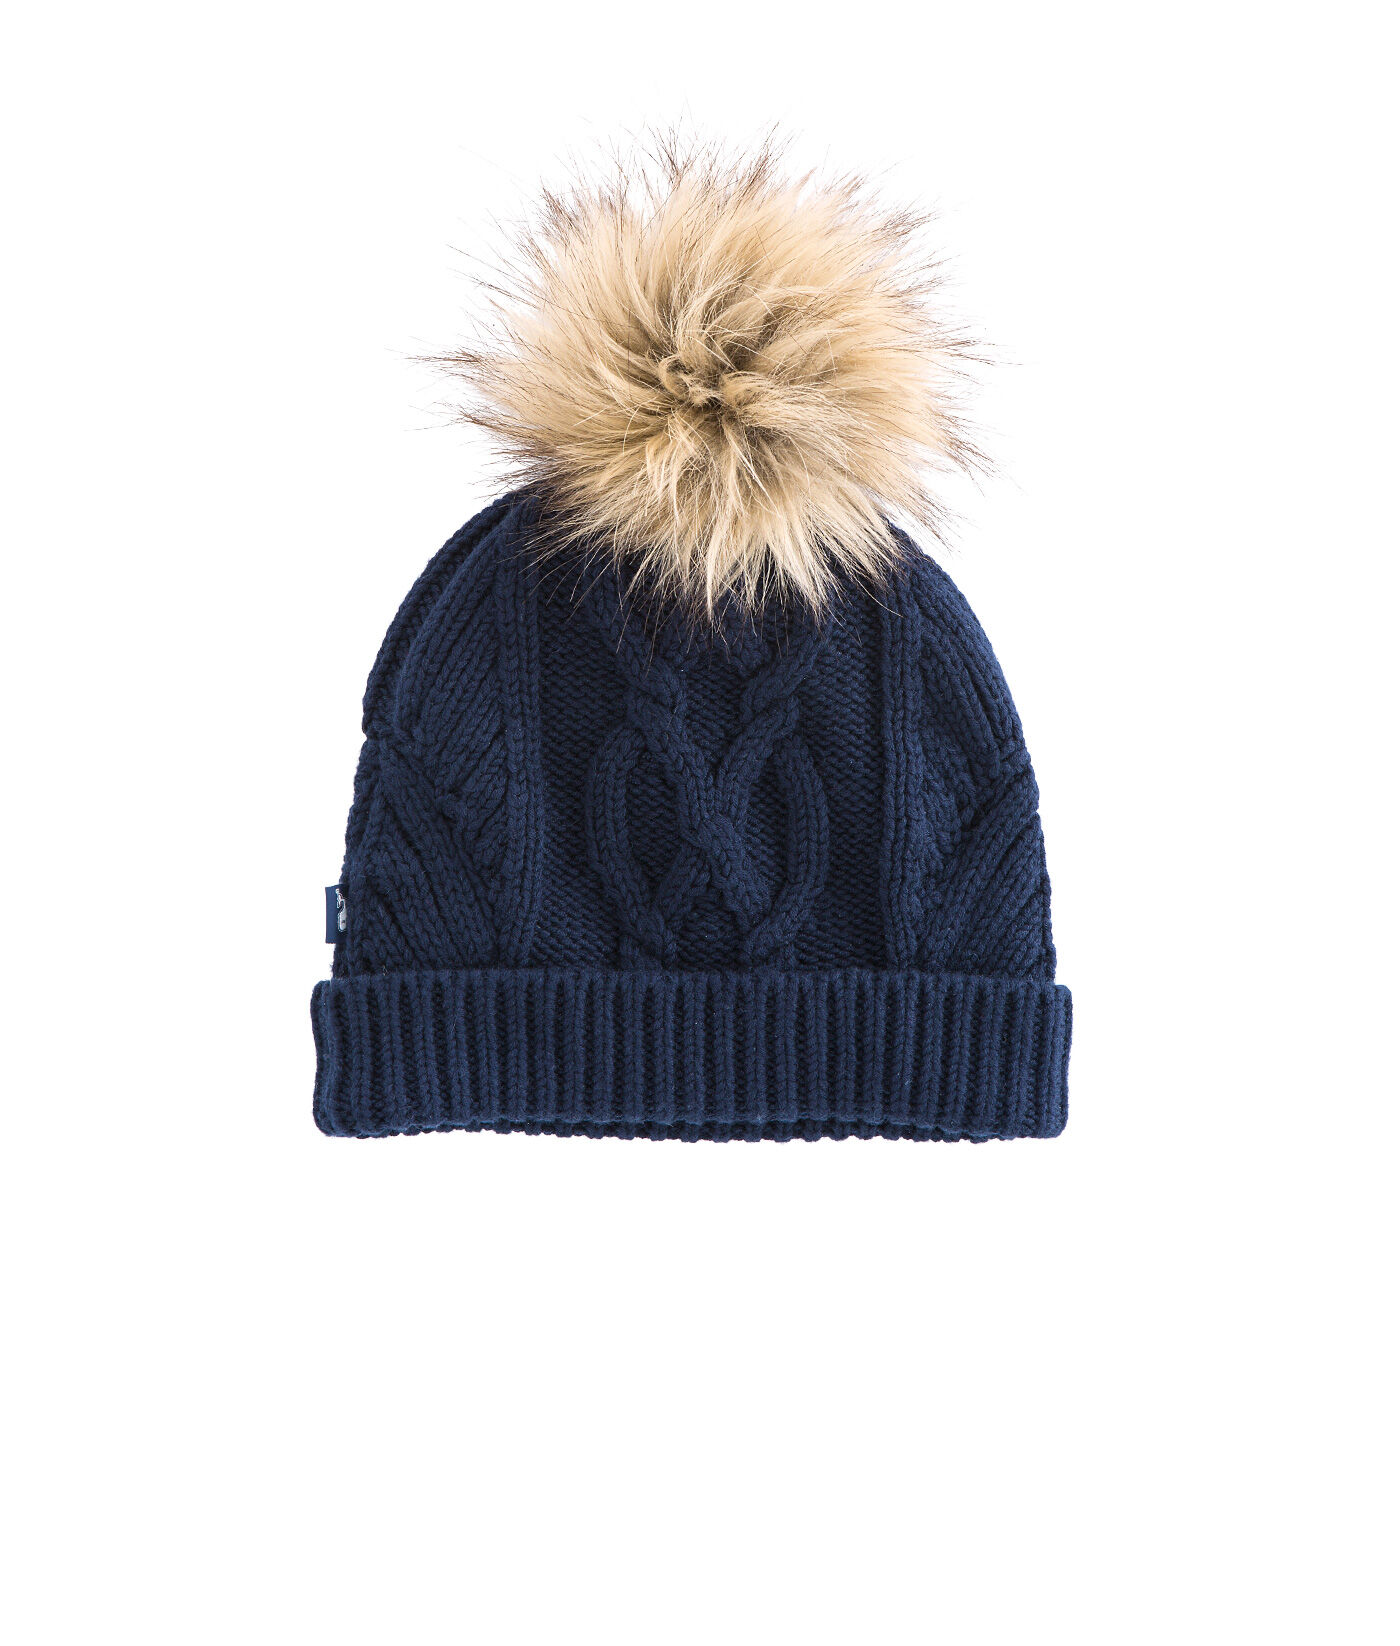 6cbdf5e8 inexpensive new nfl knit hat zip code b9bf1 6857b